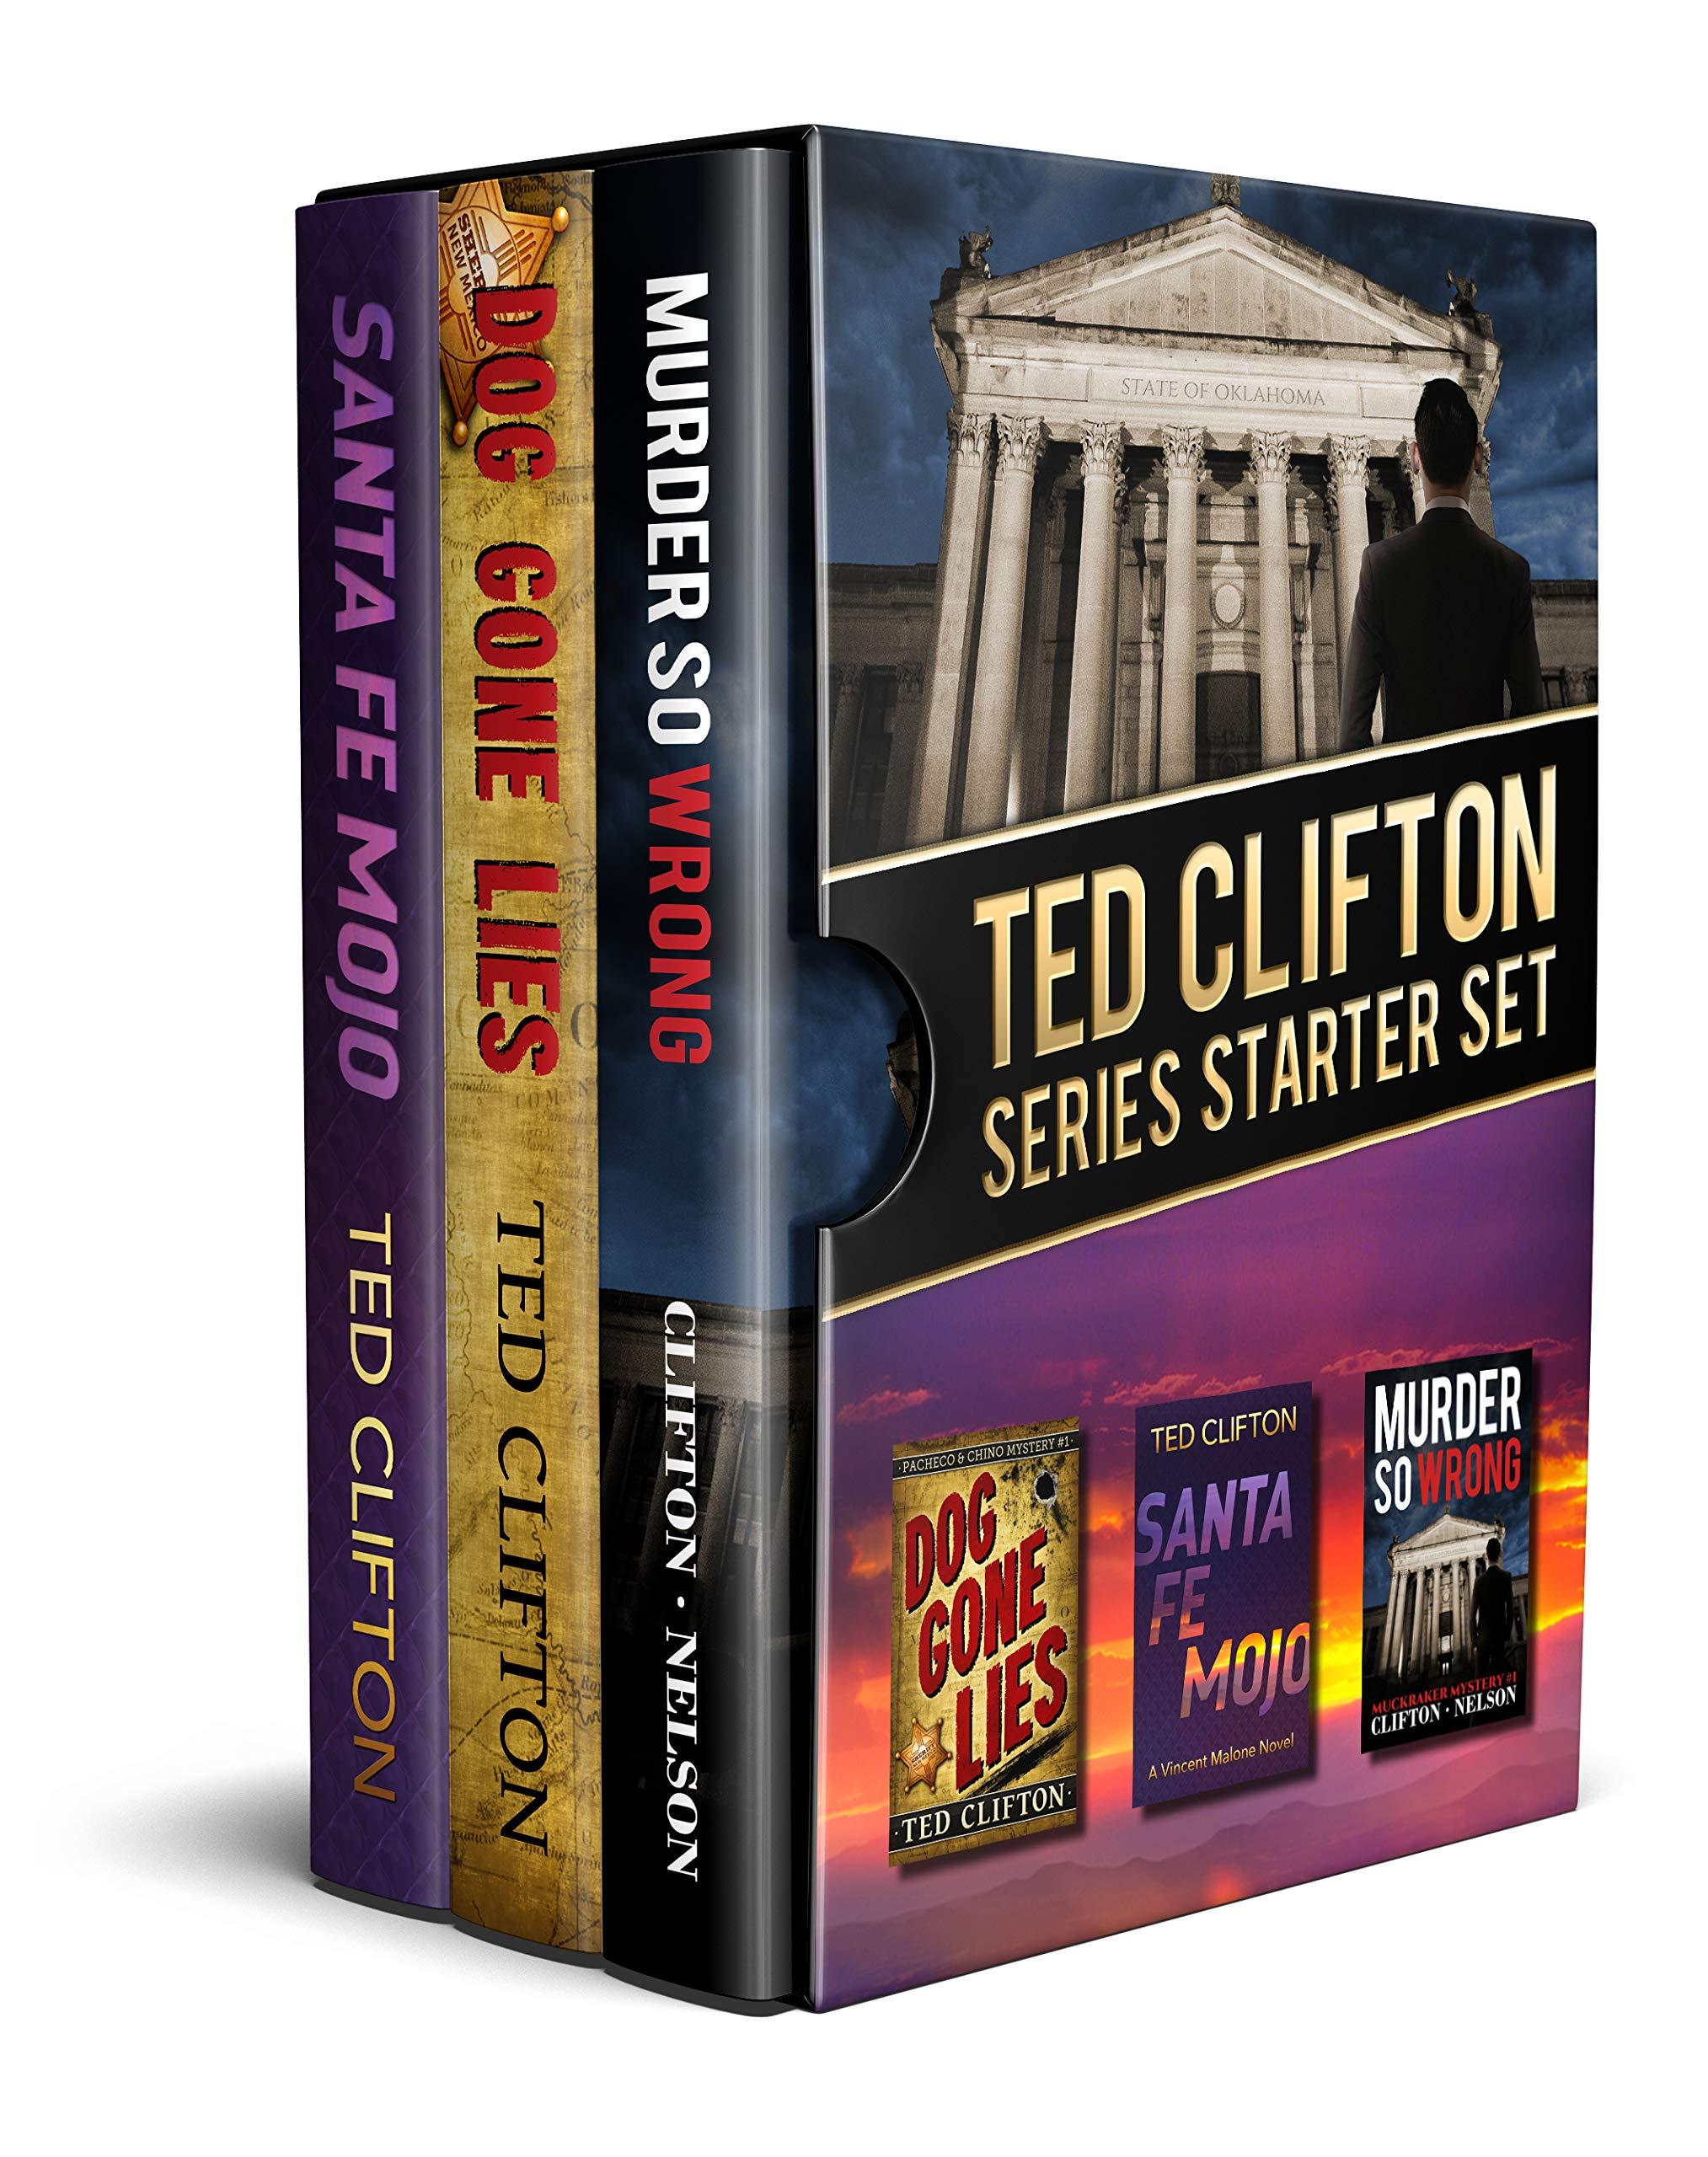 Ted Clifton Series Starter Set: Santa Fe Mojo, Dog Gone Lies, Murder So Wrong